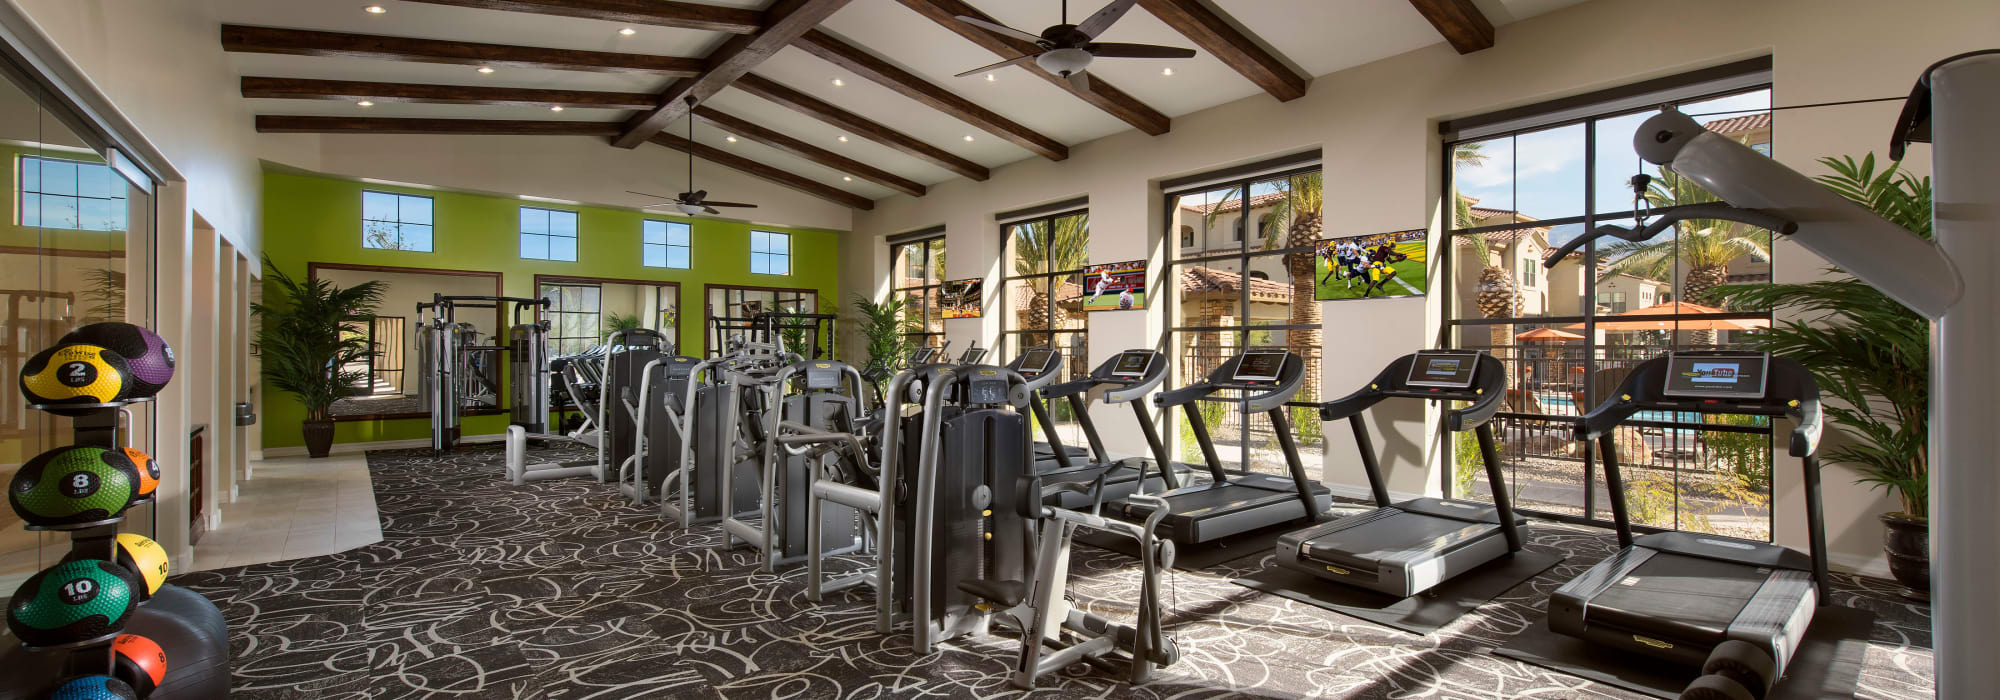 Fitness center at San Valencia in Chandler, Arizona